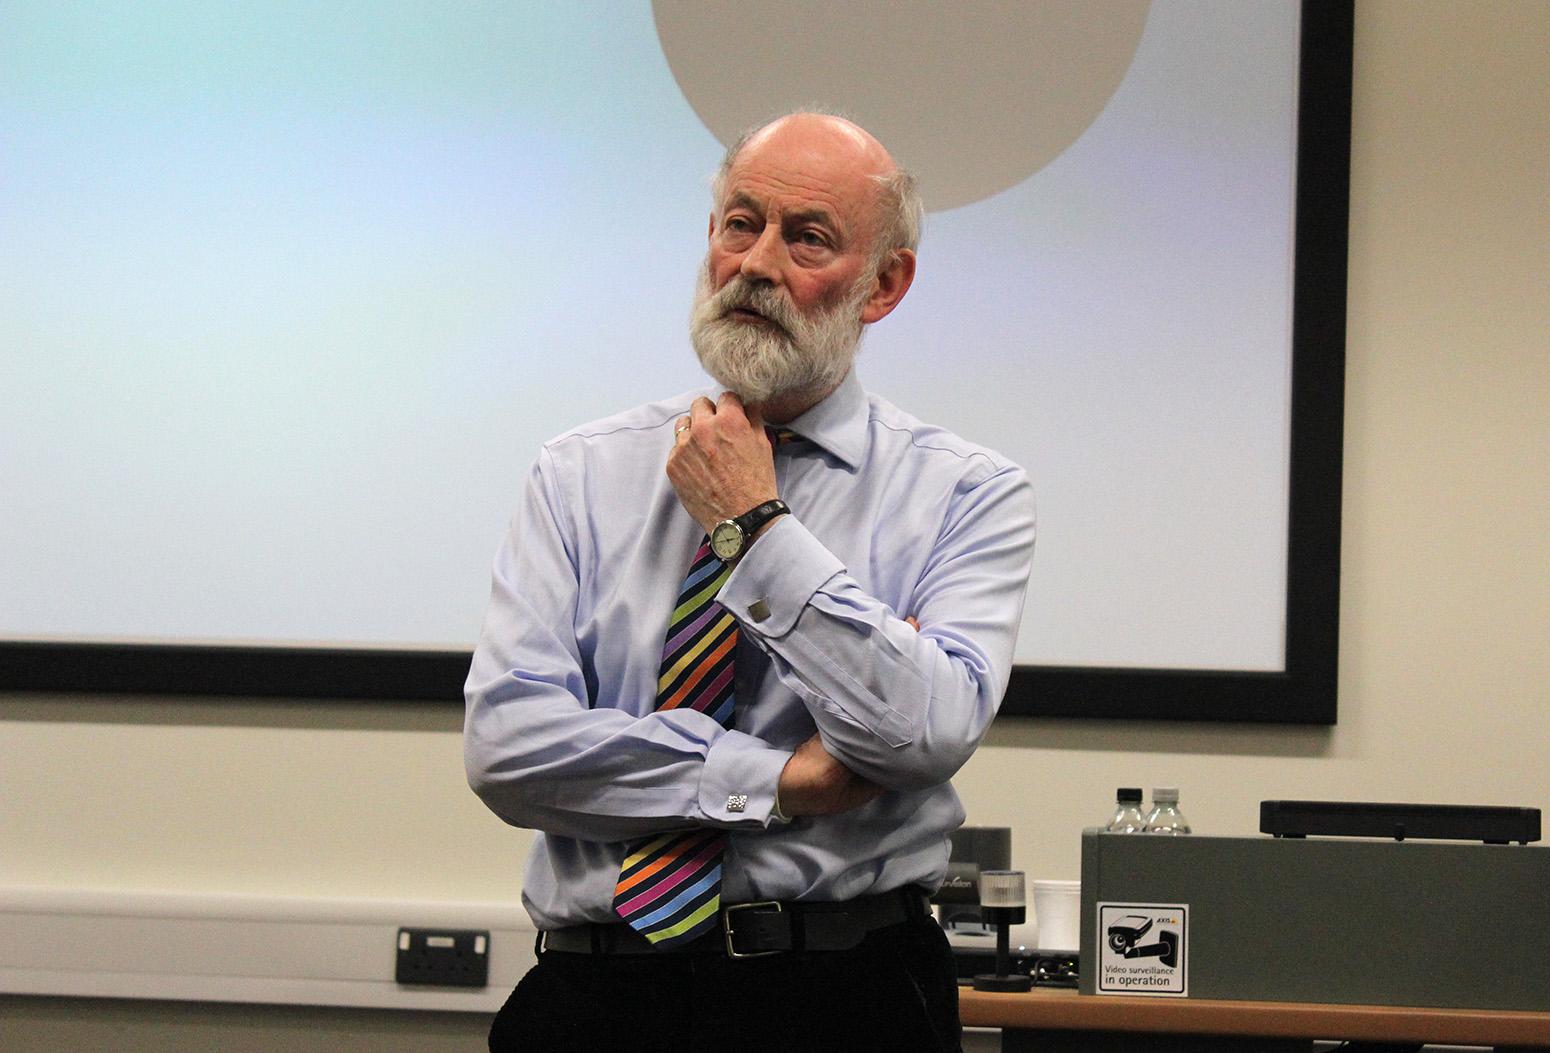 Prof Raymond Tallis. Credit: Tom Prater / Maudsley Philosophy Group